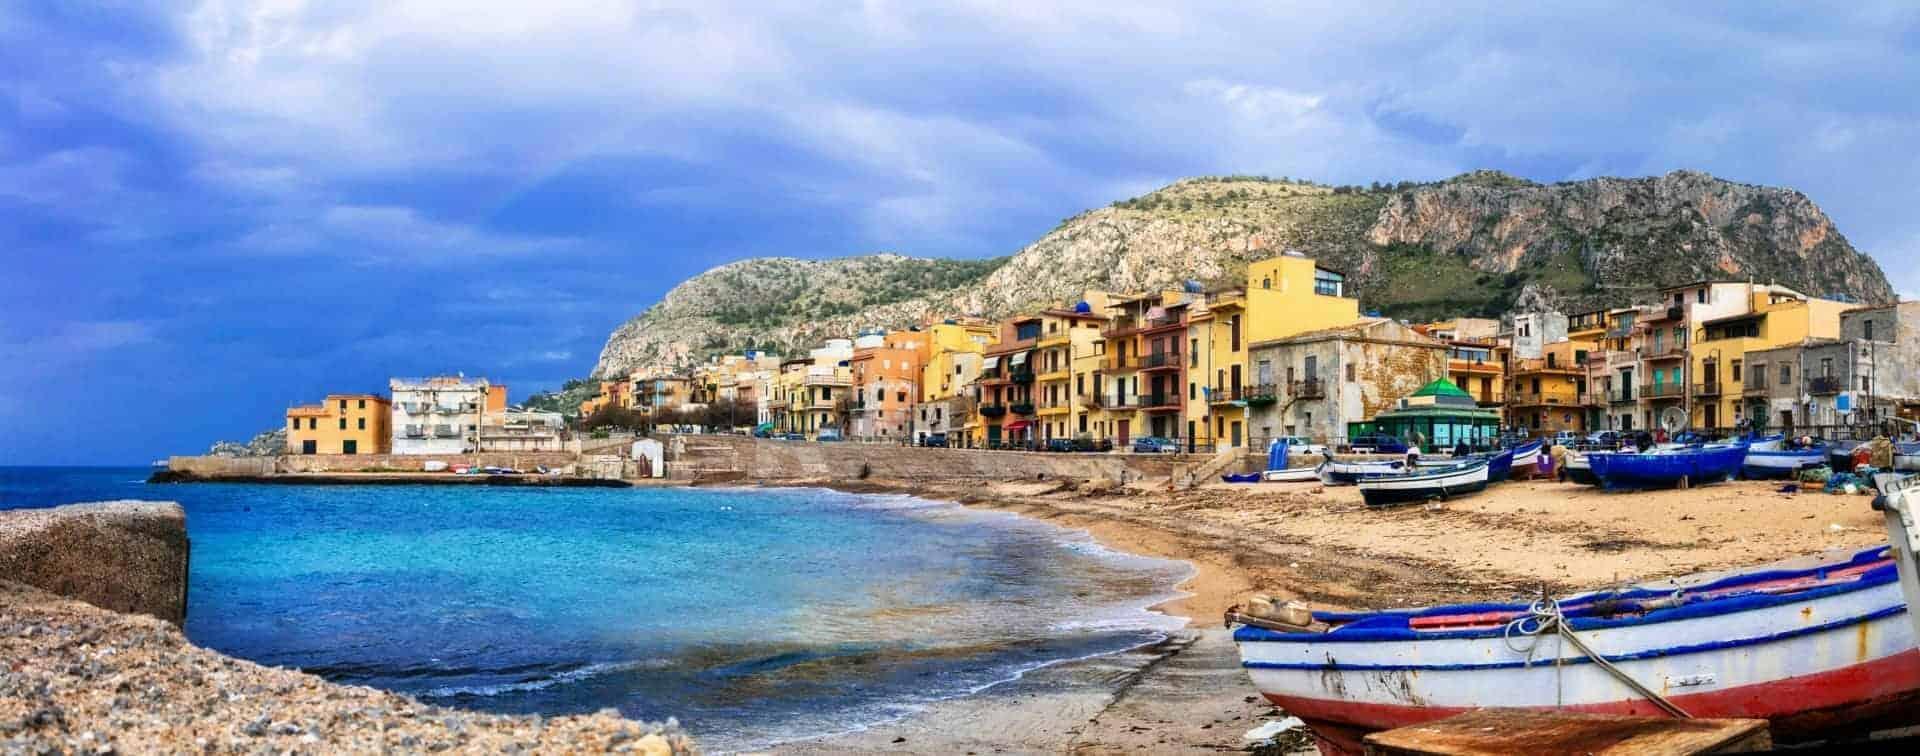 Traditional fishing village Aspra in Sicily, Italy